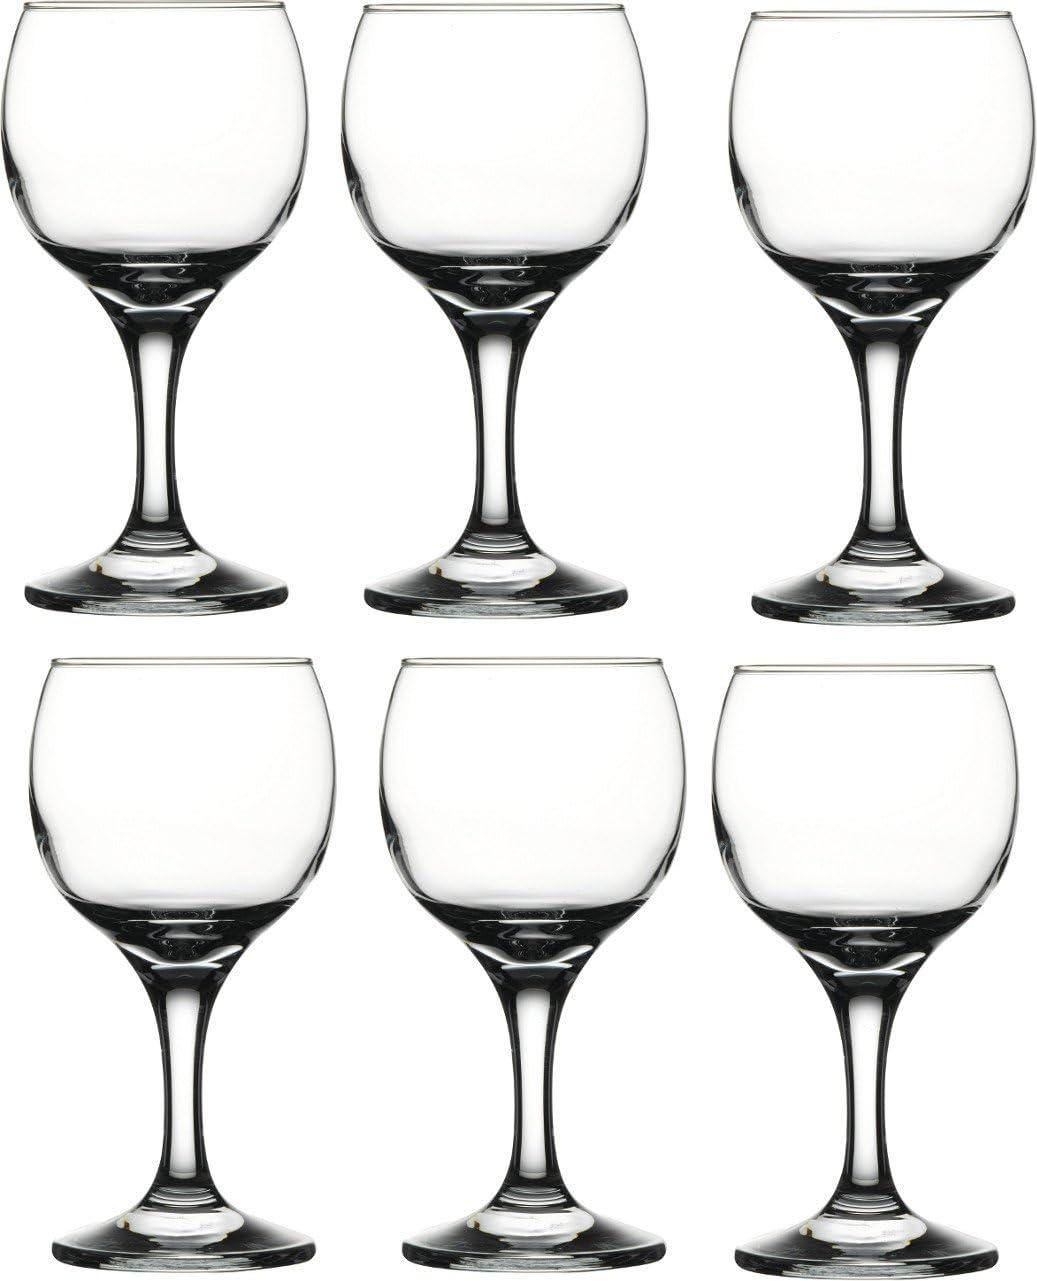 Clear 11.25 oz Savannah Street Wine Glasses Set of 6